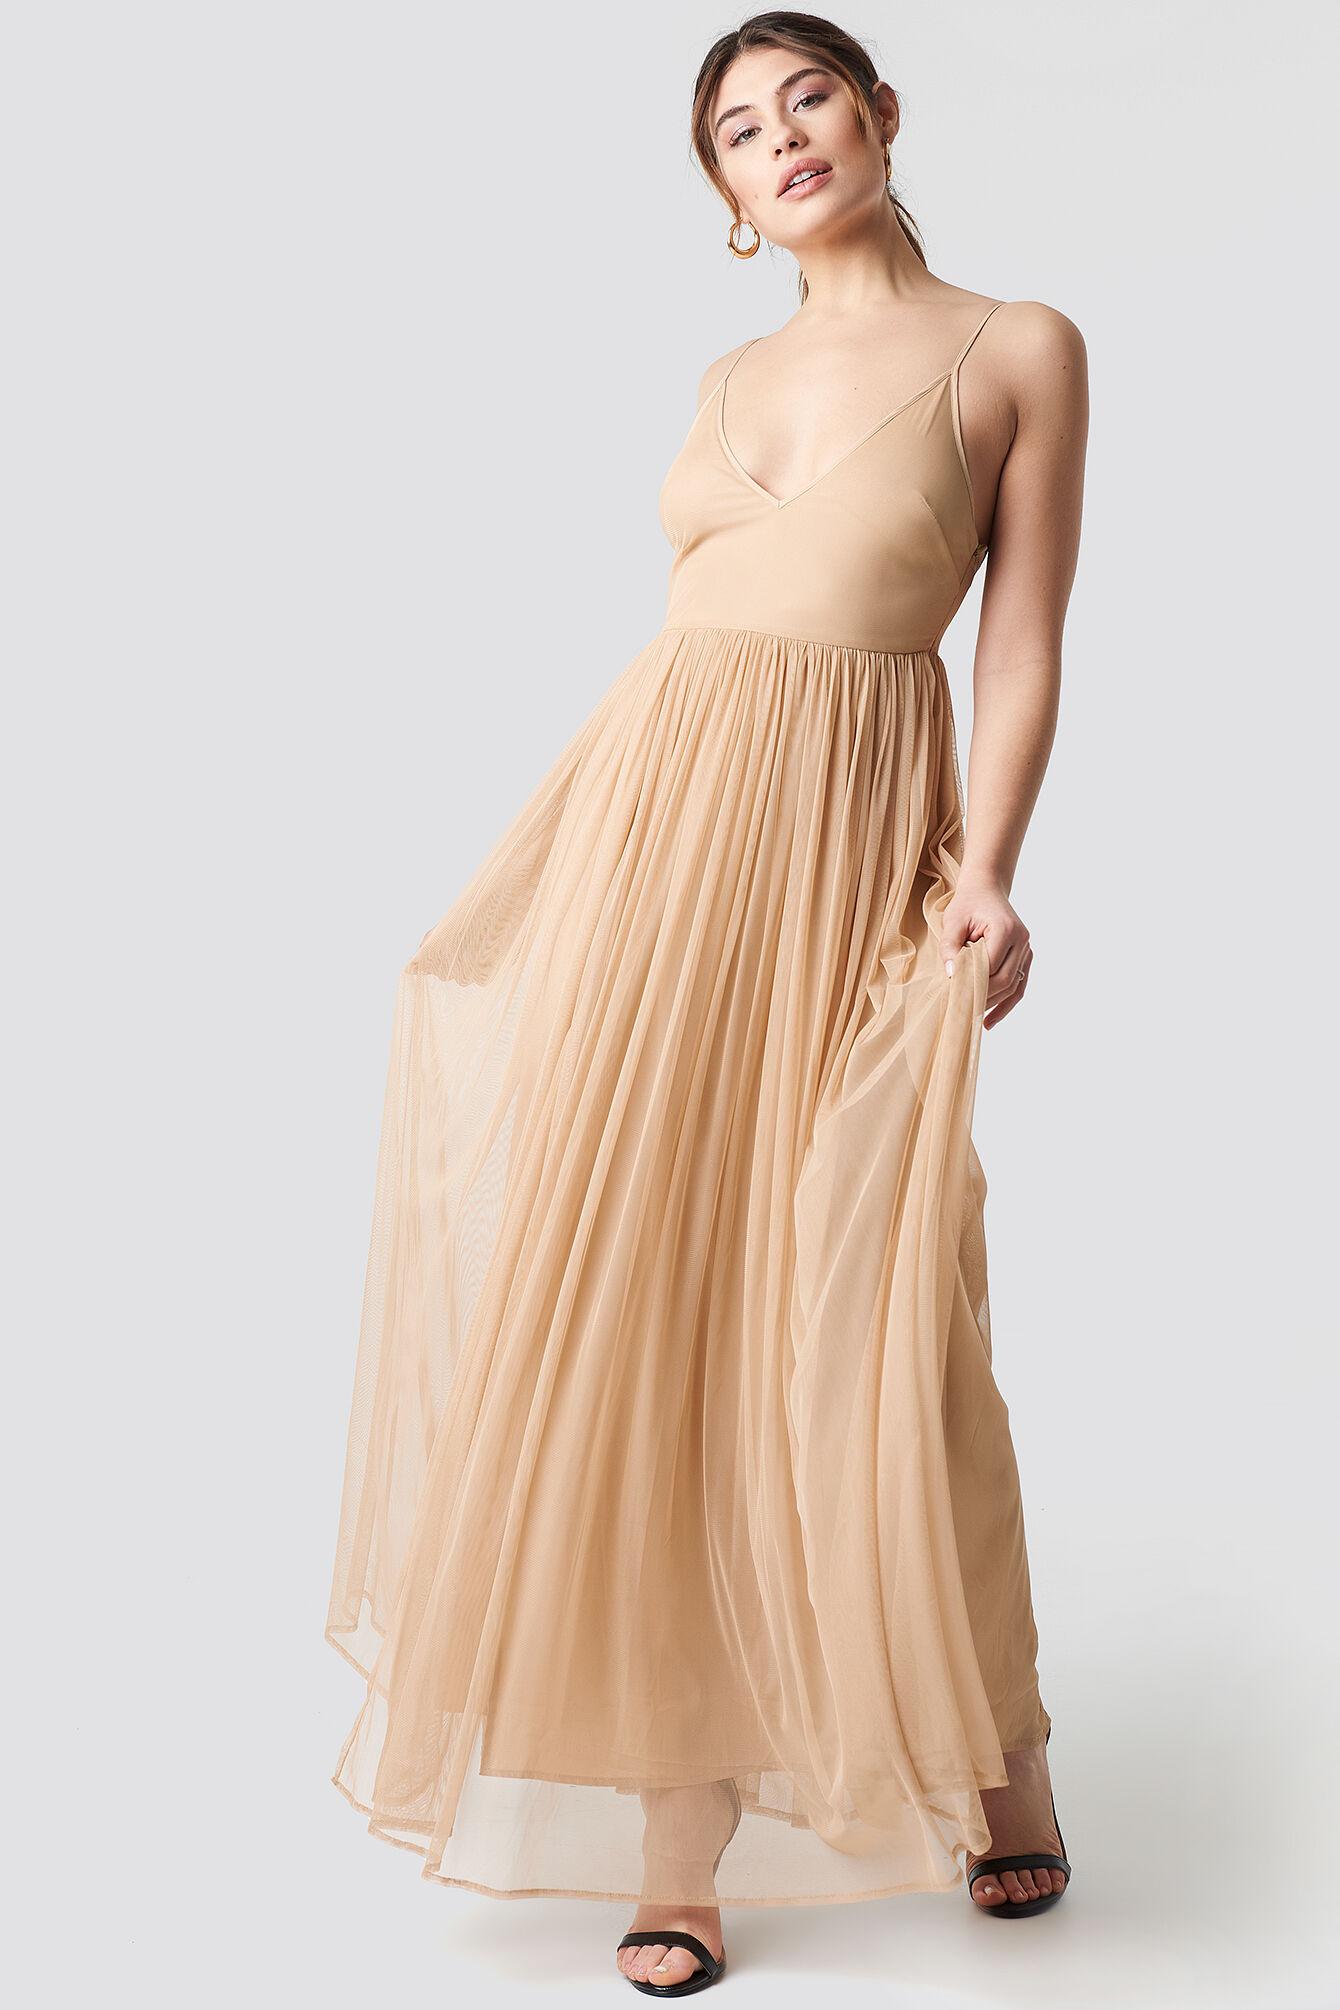 Image of Pamela x NA-KD Front Slit Flowy Dress - Nude